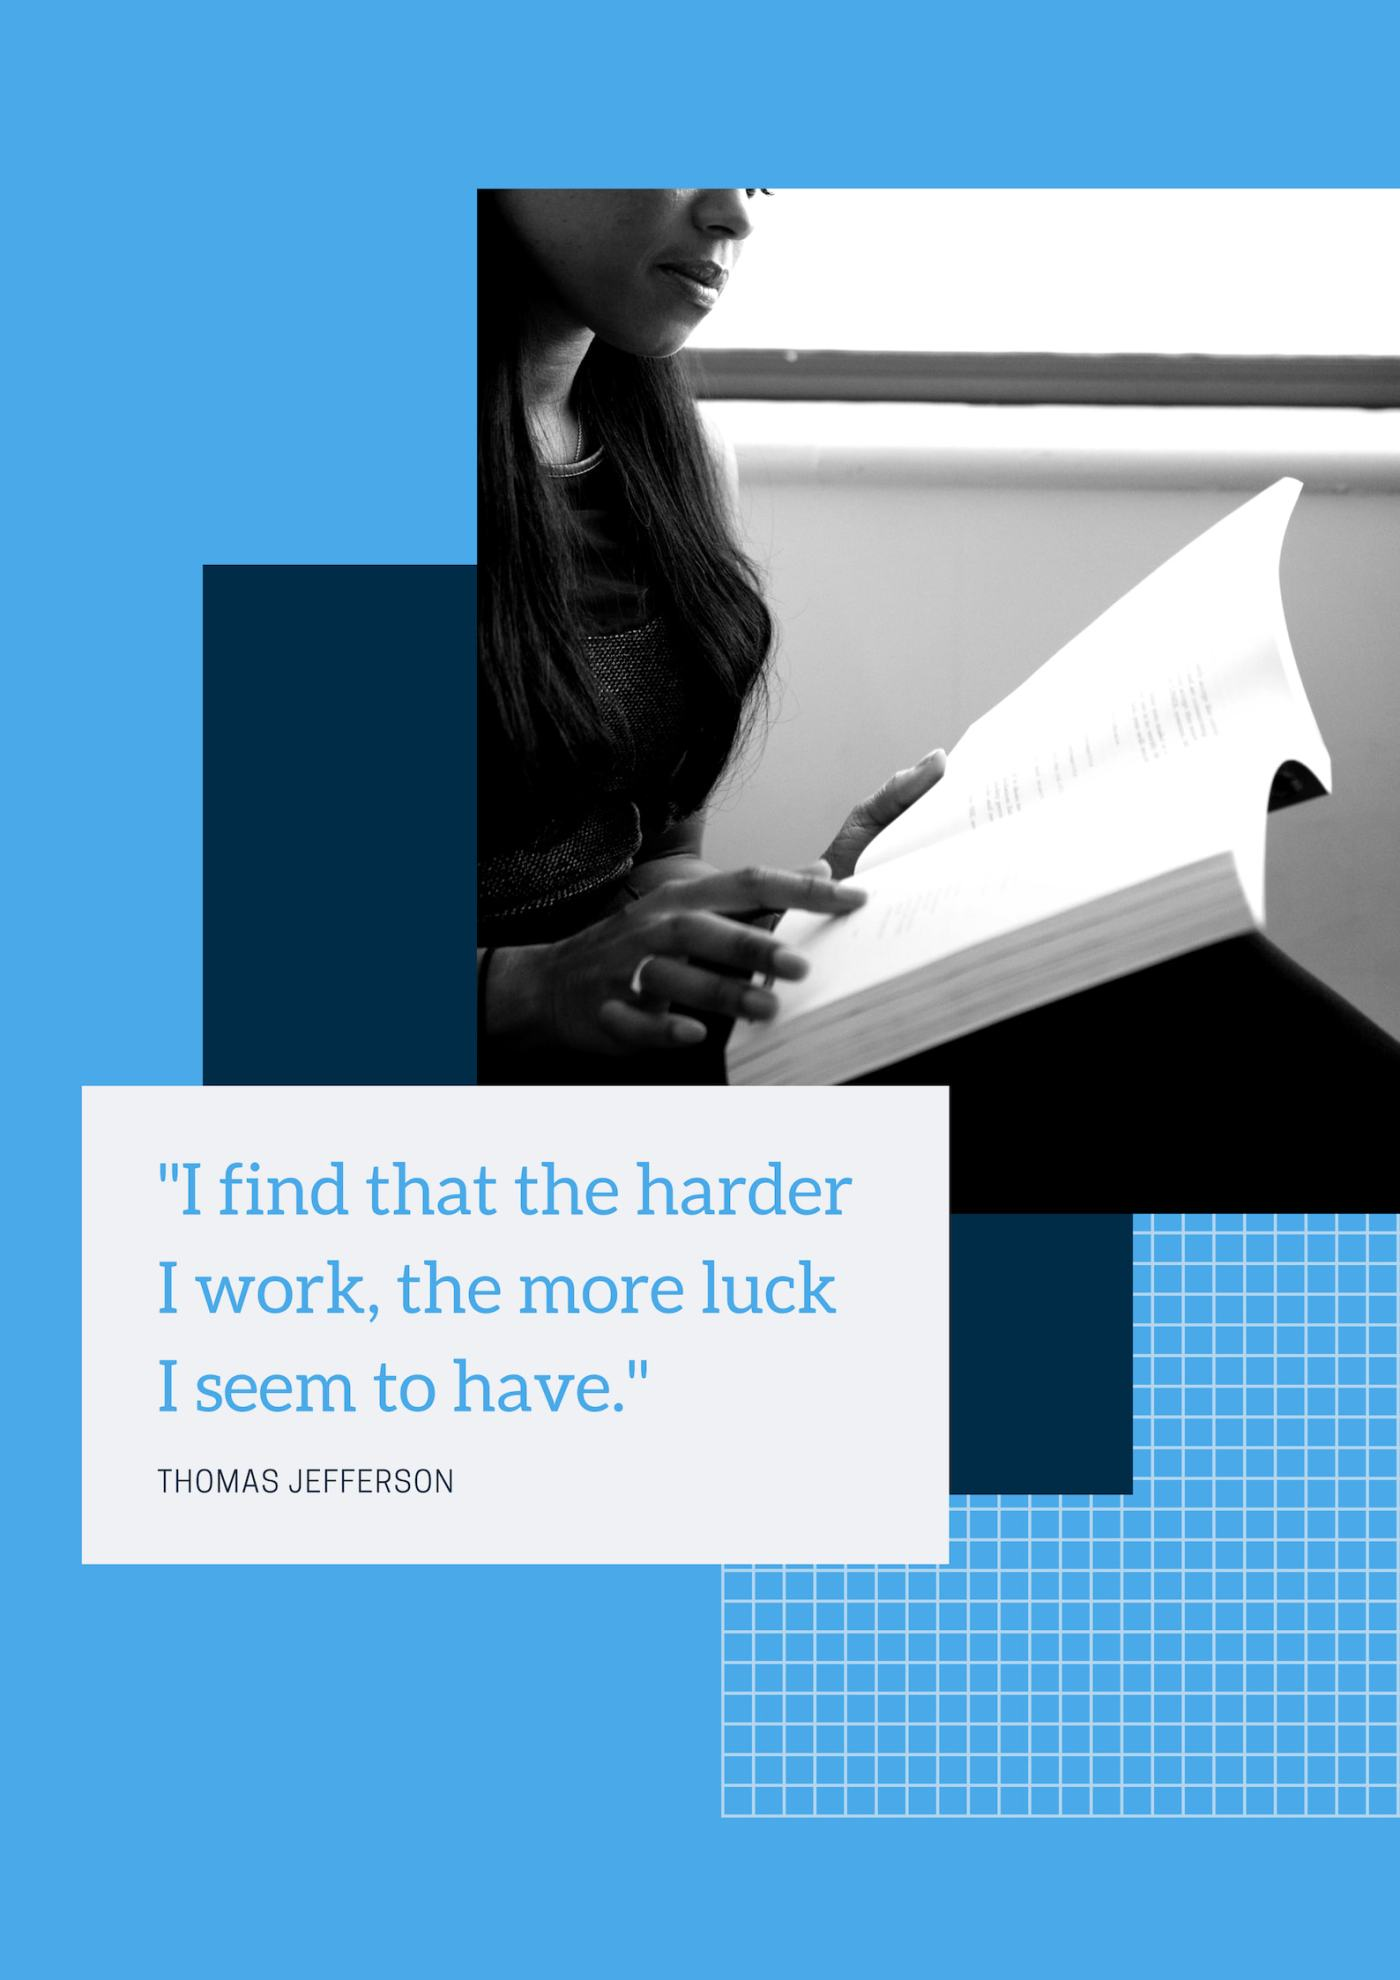 Few Random Inspiring Quotes For Students